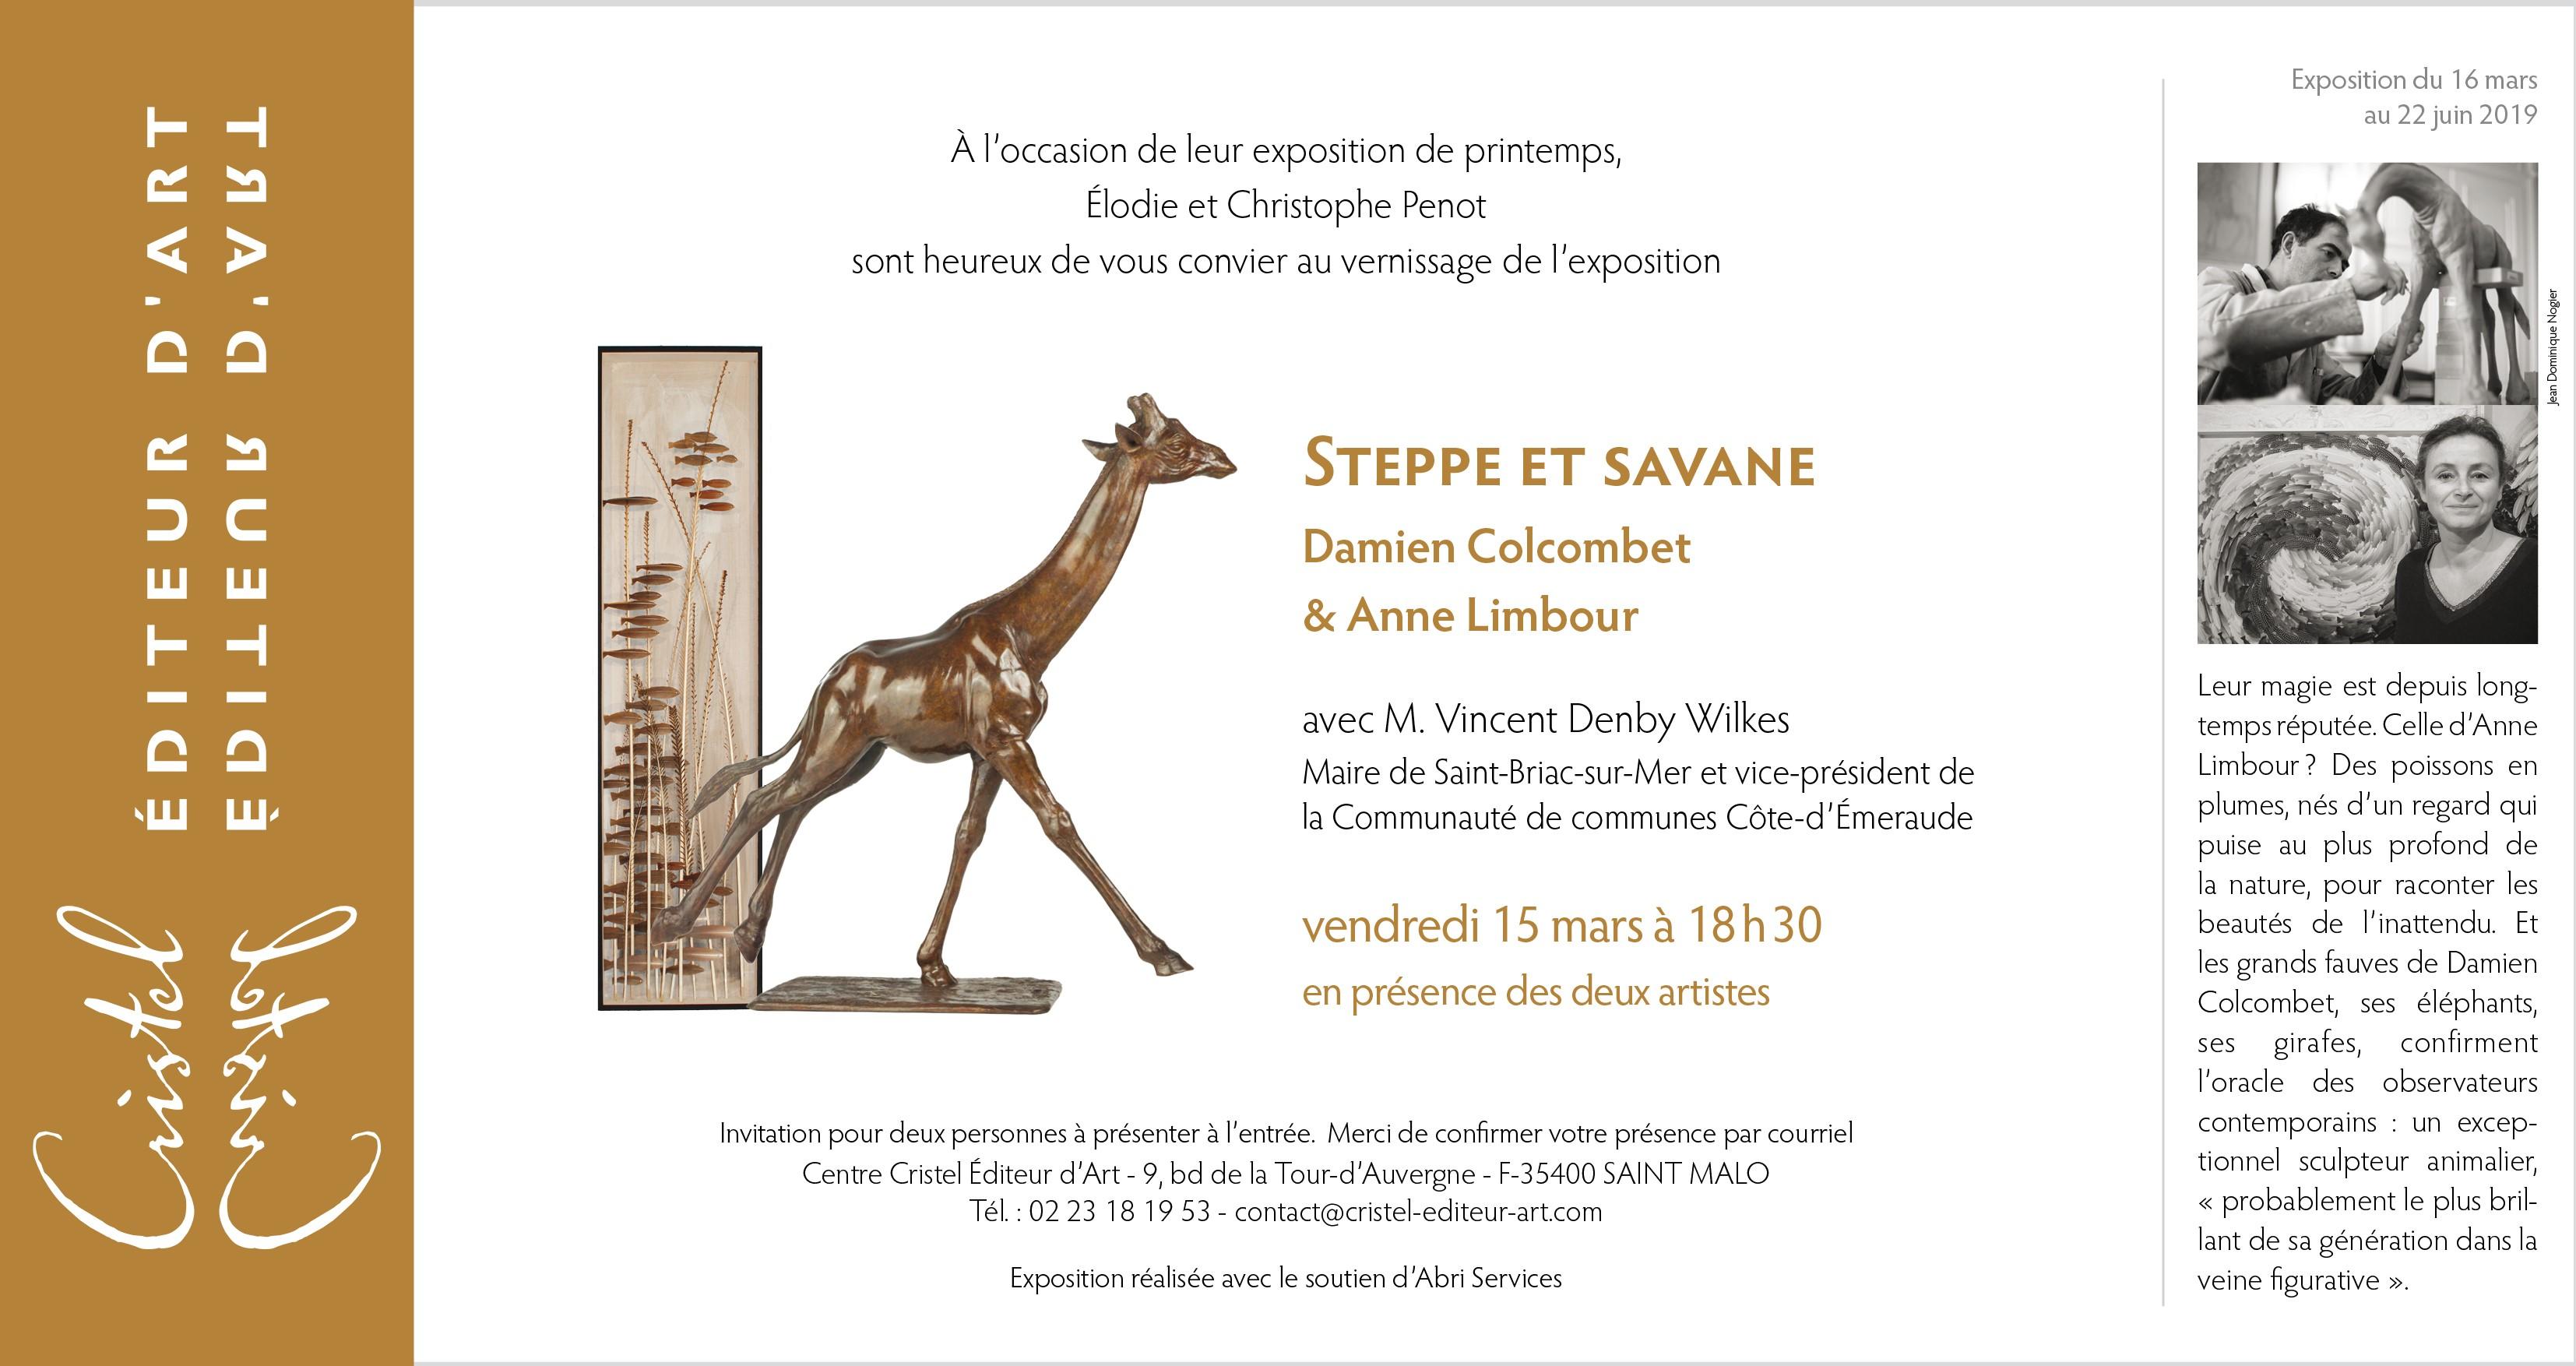 Invitation exposition Colcombet Limbour Saint-Malo Cristel